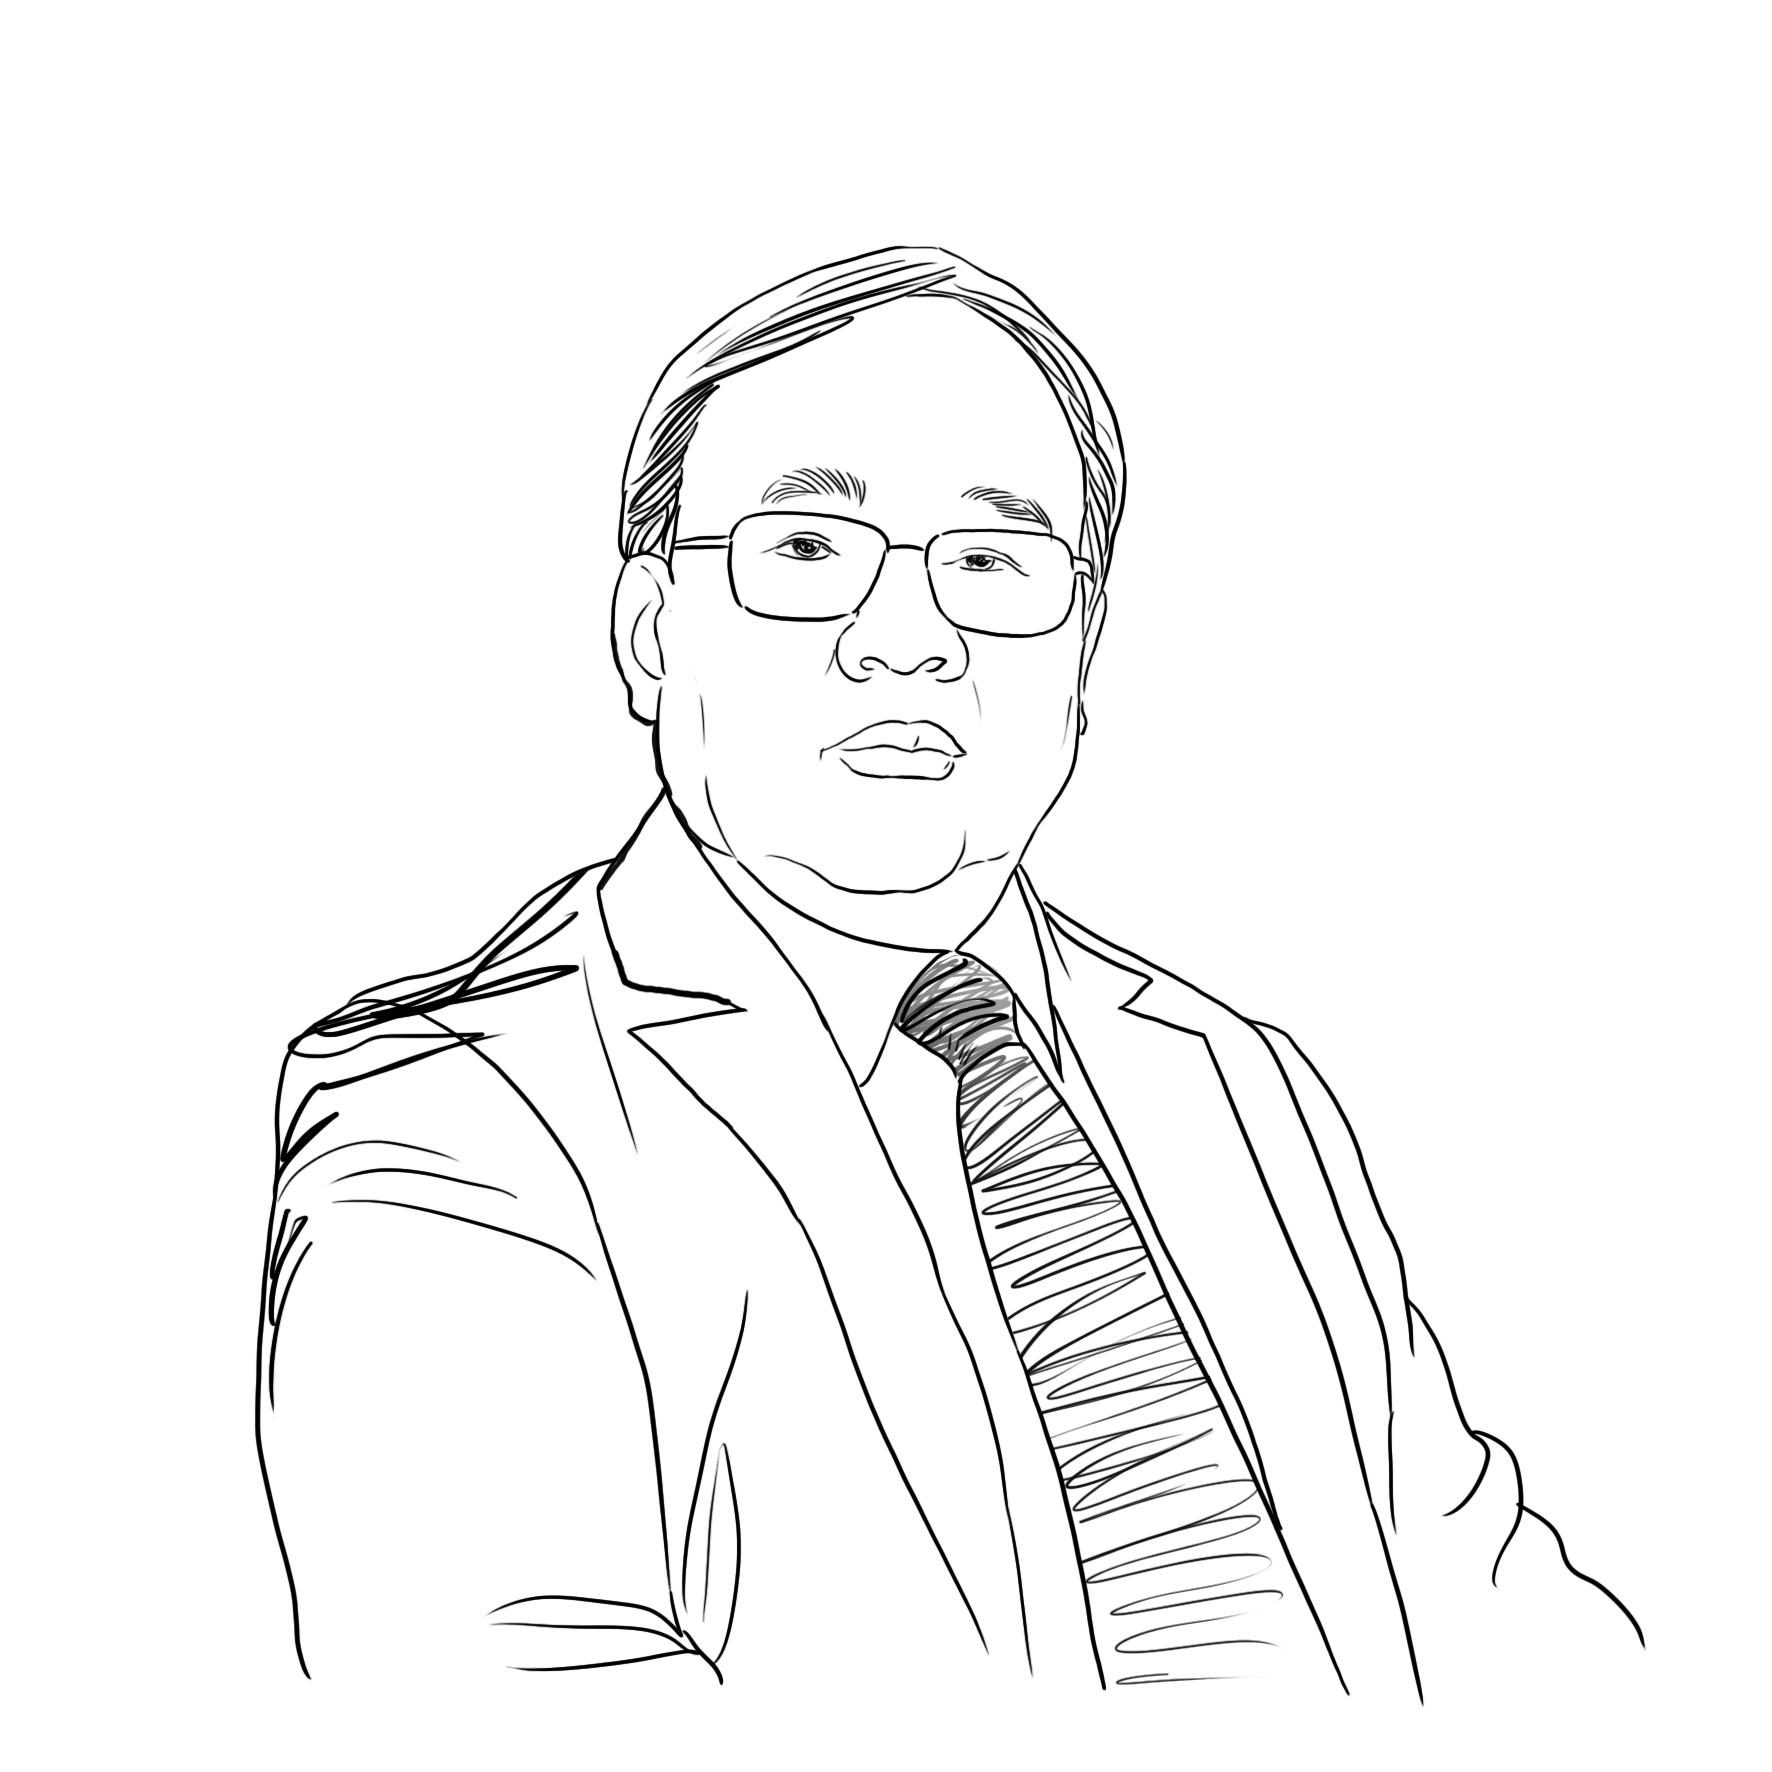 usdt无需实名买入卖出(www.caibao.it):赵晋平:预计今年出口增约10% 东盟欧洲在中国商业占比会上升